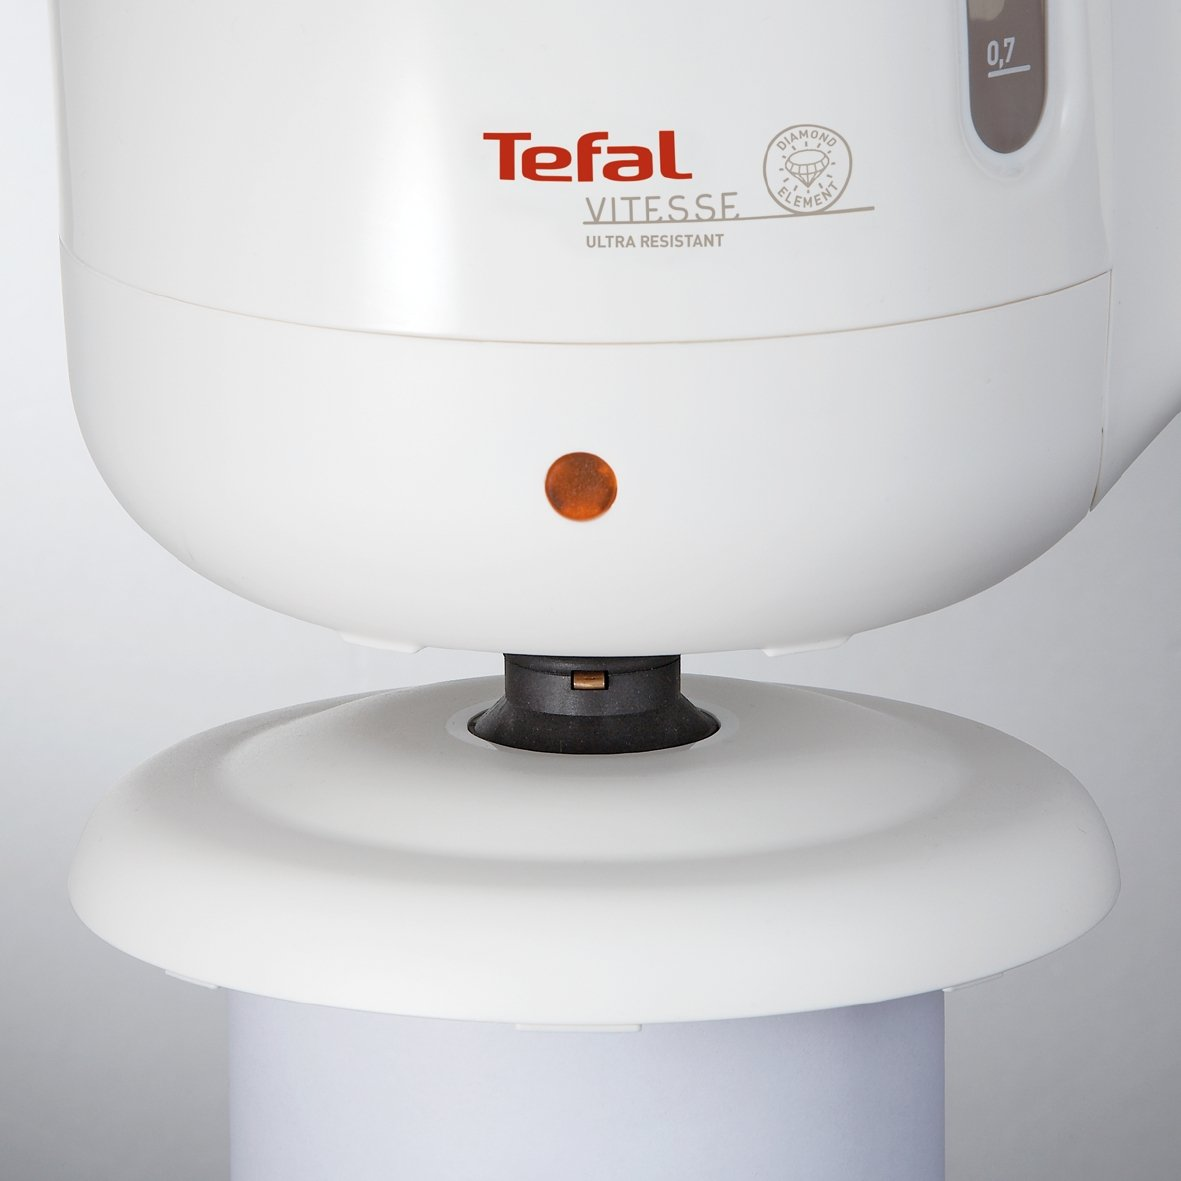 Tefal BF 2130 VITESSE, Blanco, 196 x 198 x 239 mm - Calentador de agua: Amazon.es: Hogar